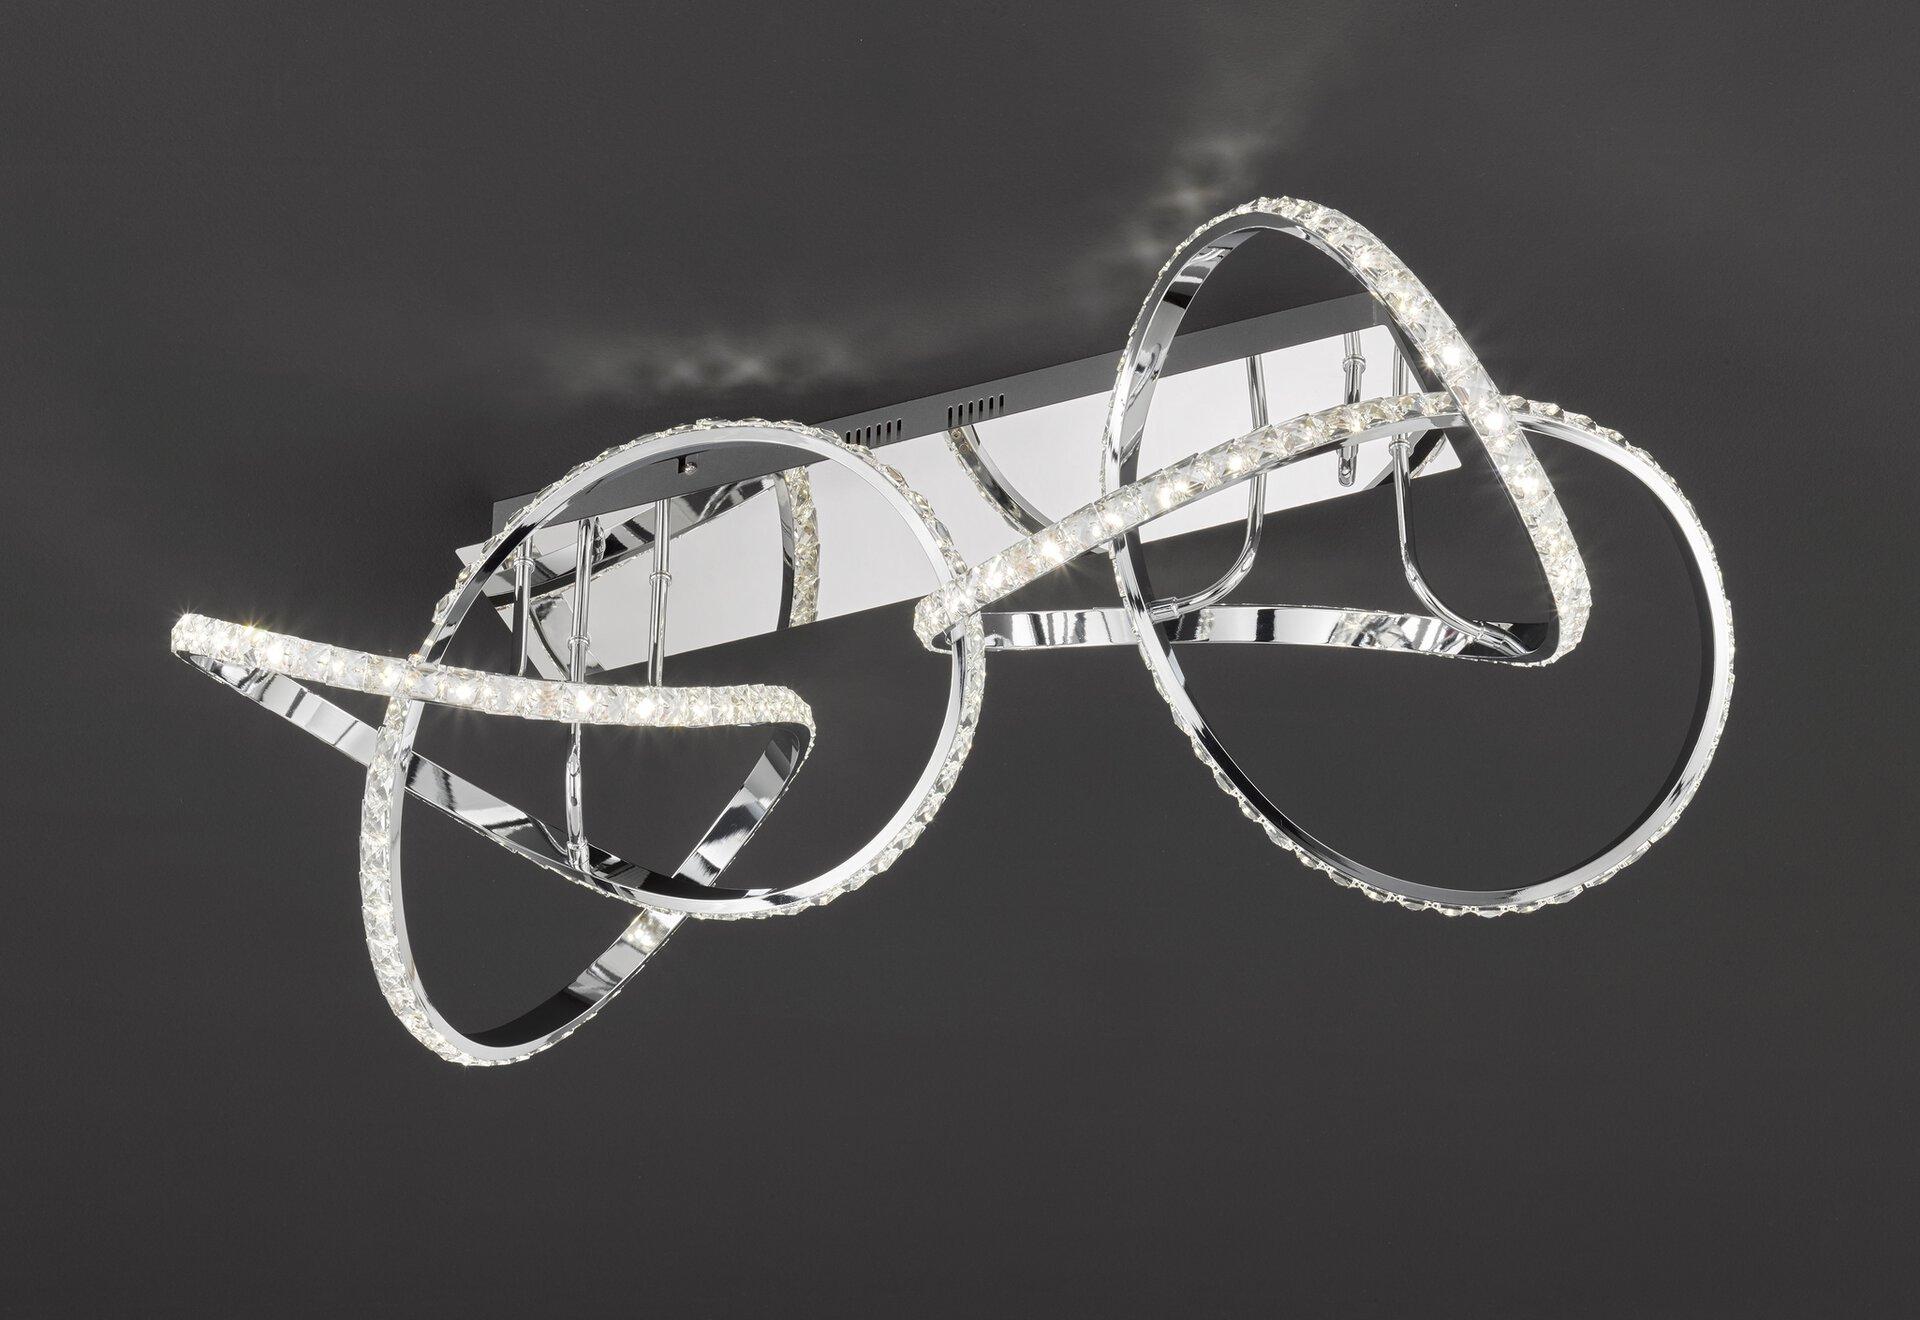 Deckenleuchte ABRO Wofi Leuchten Metall silber 46 x 31 x 91 cm